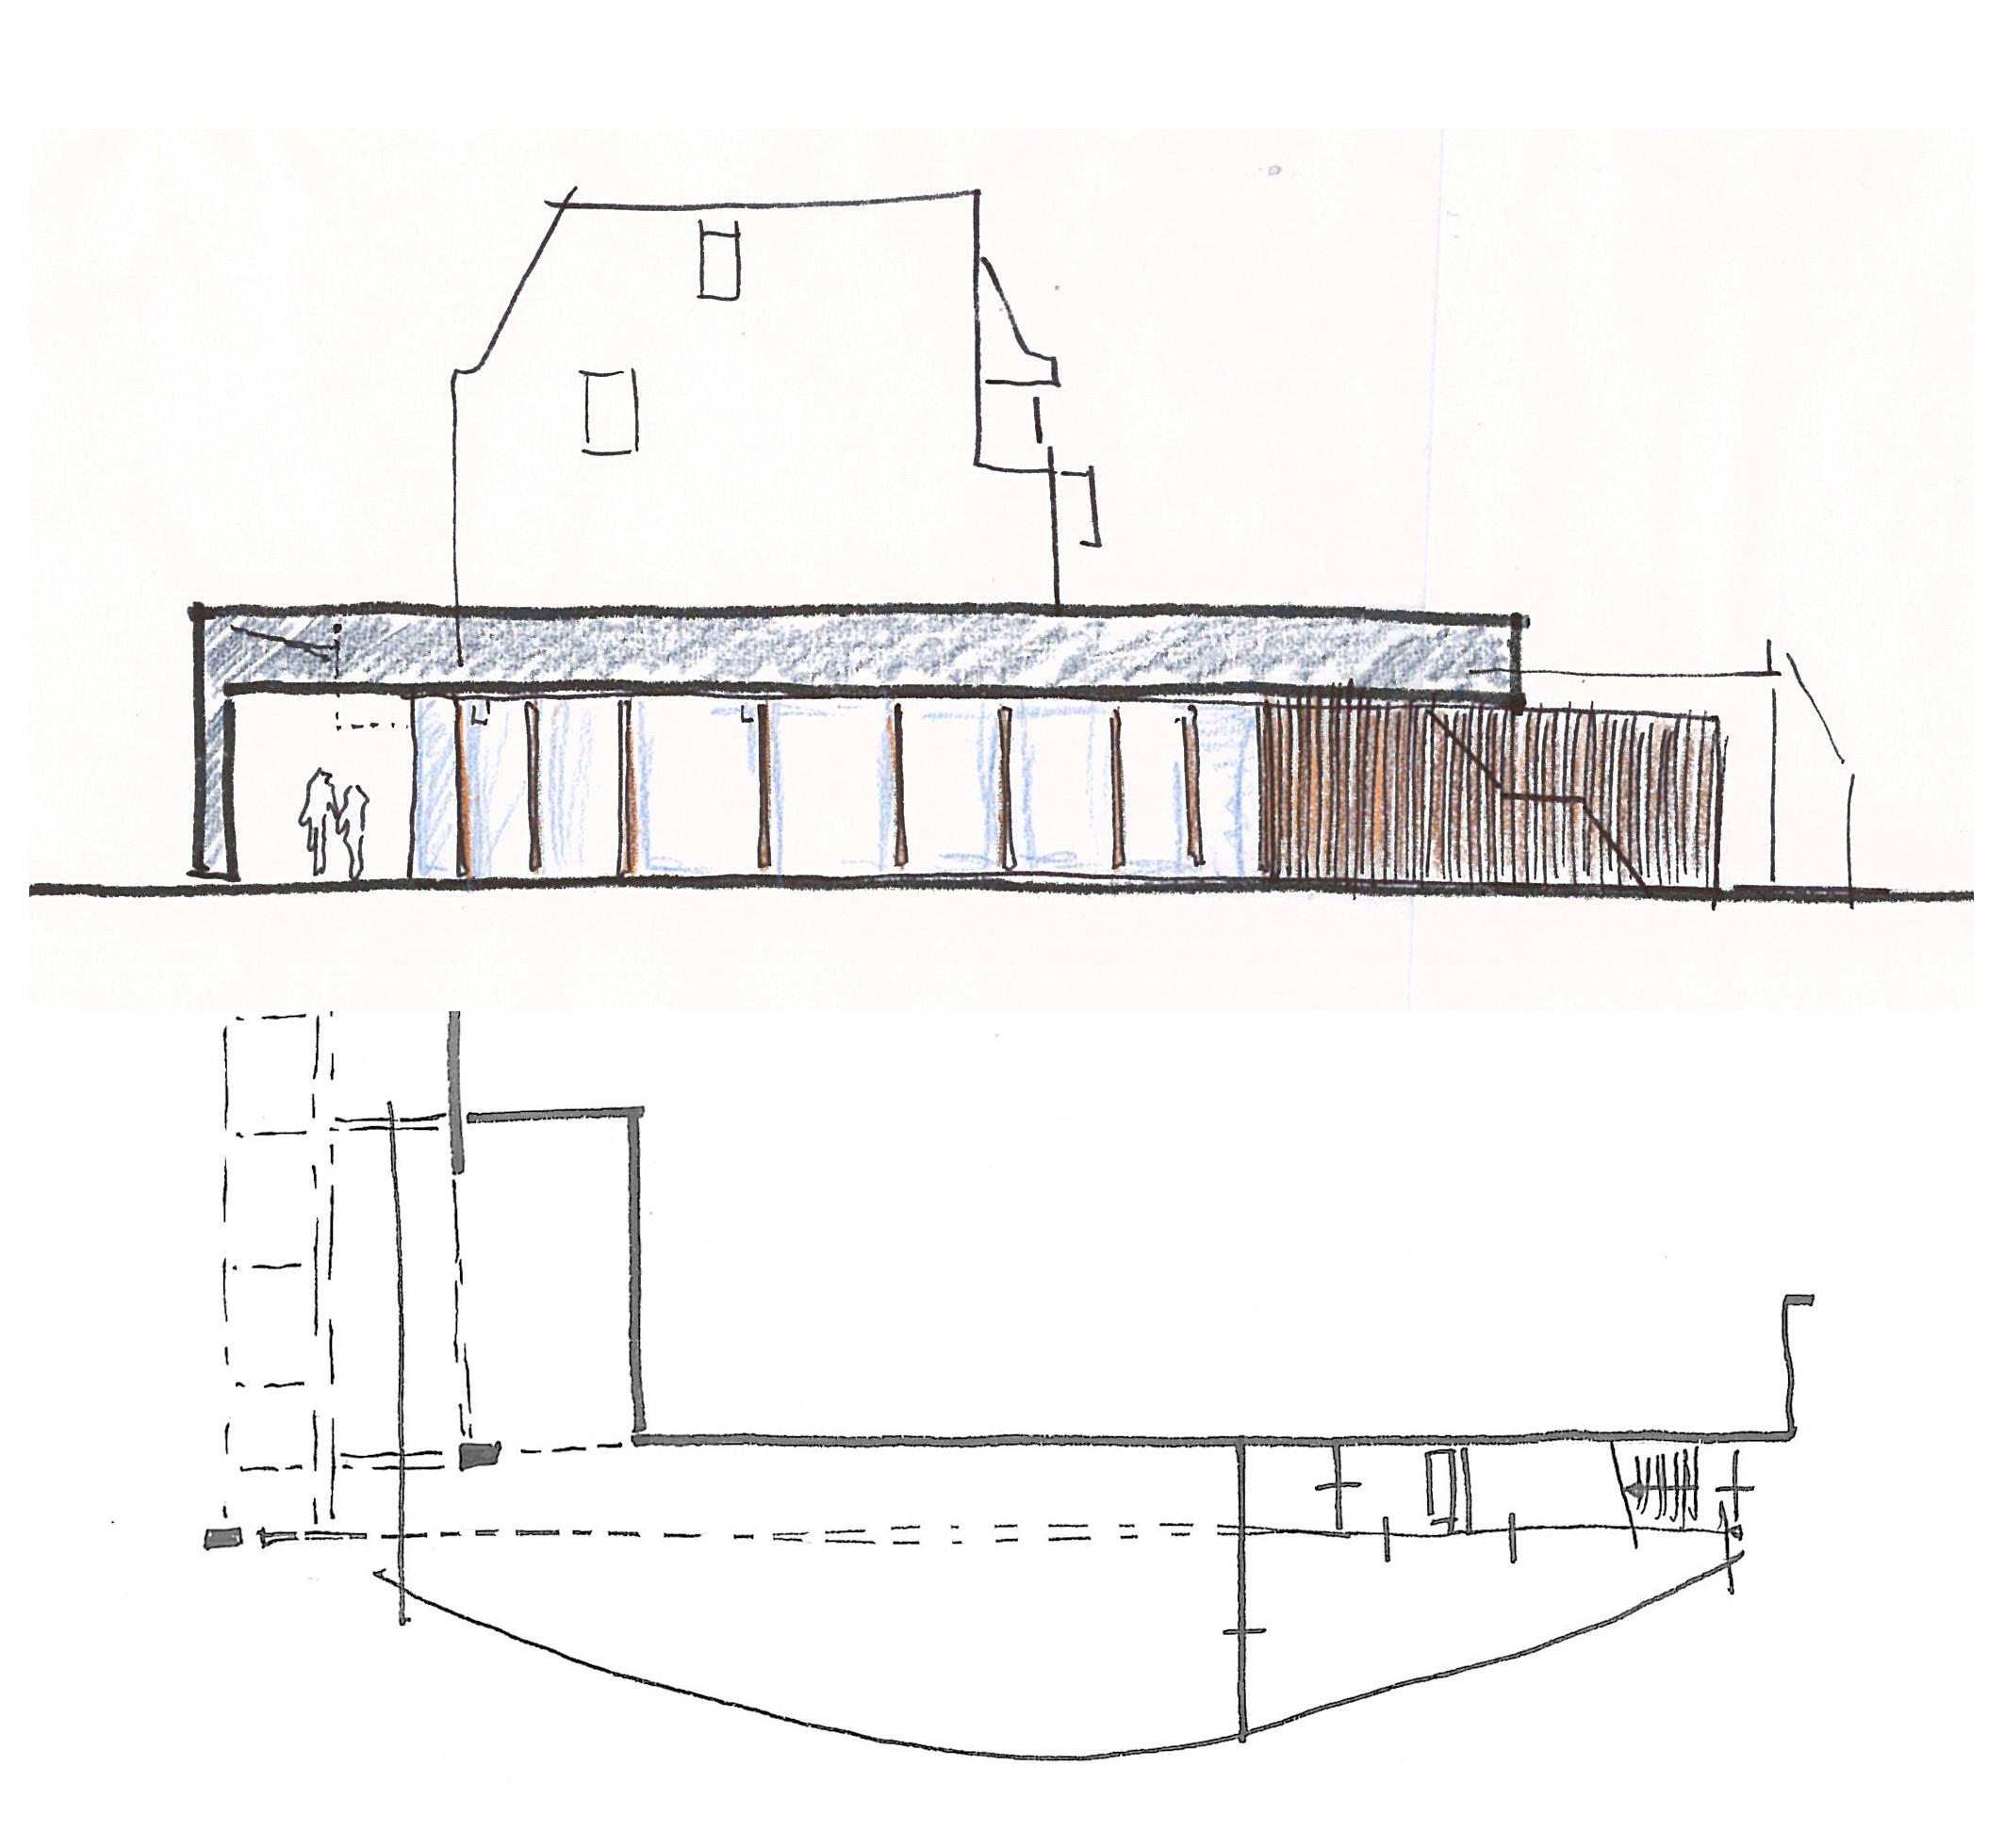 stoel_architect_kampen_bedrijfsgebouw_winkel_emmeloord (9)